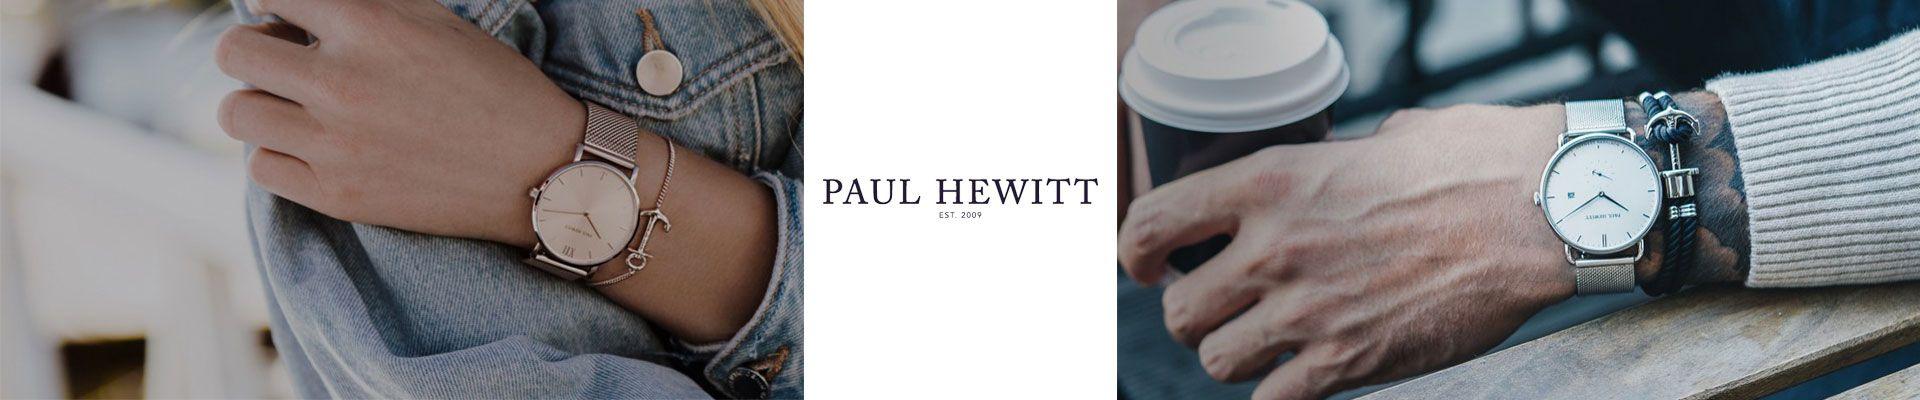 Paul Hewitt